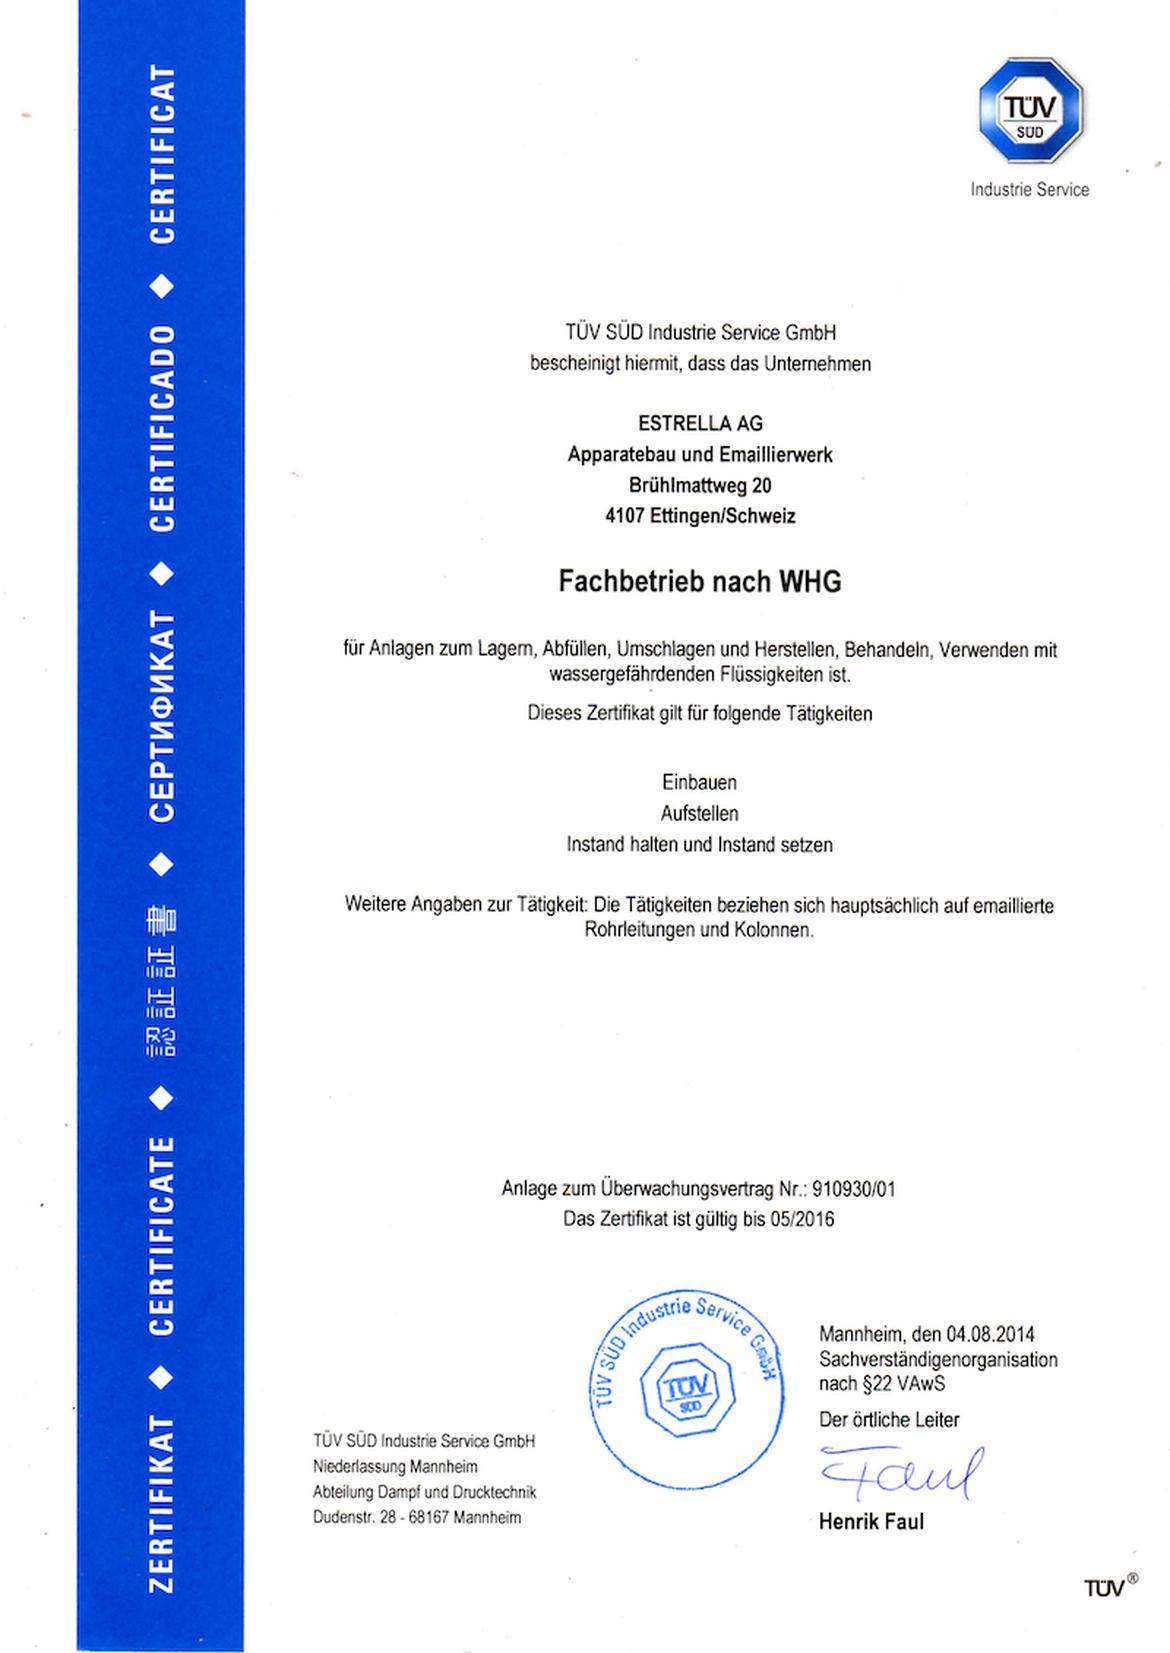 Documents - Estrella AG